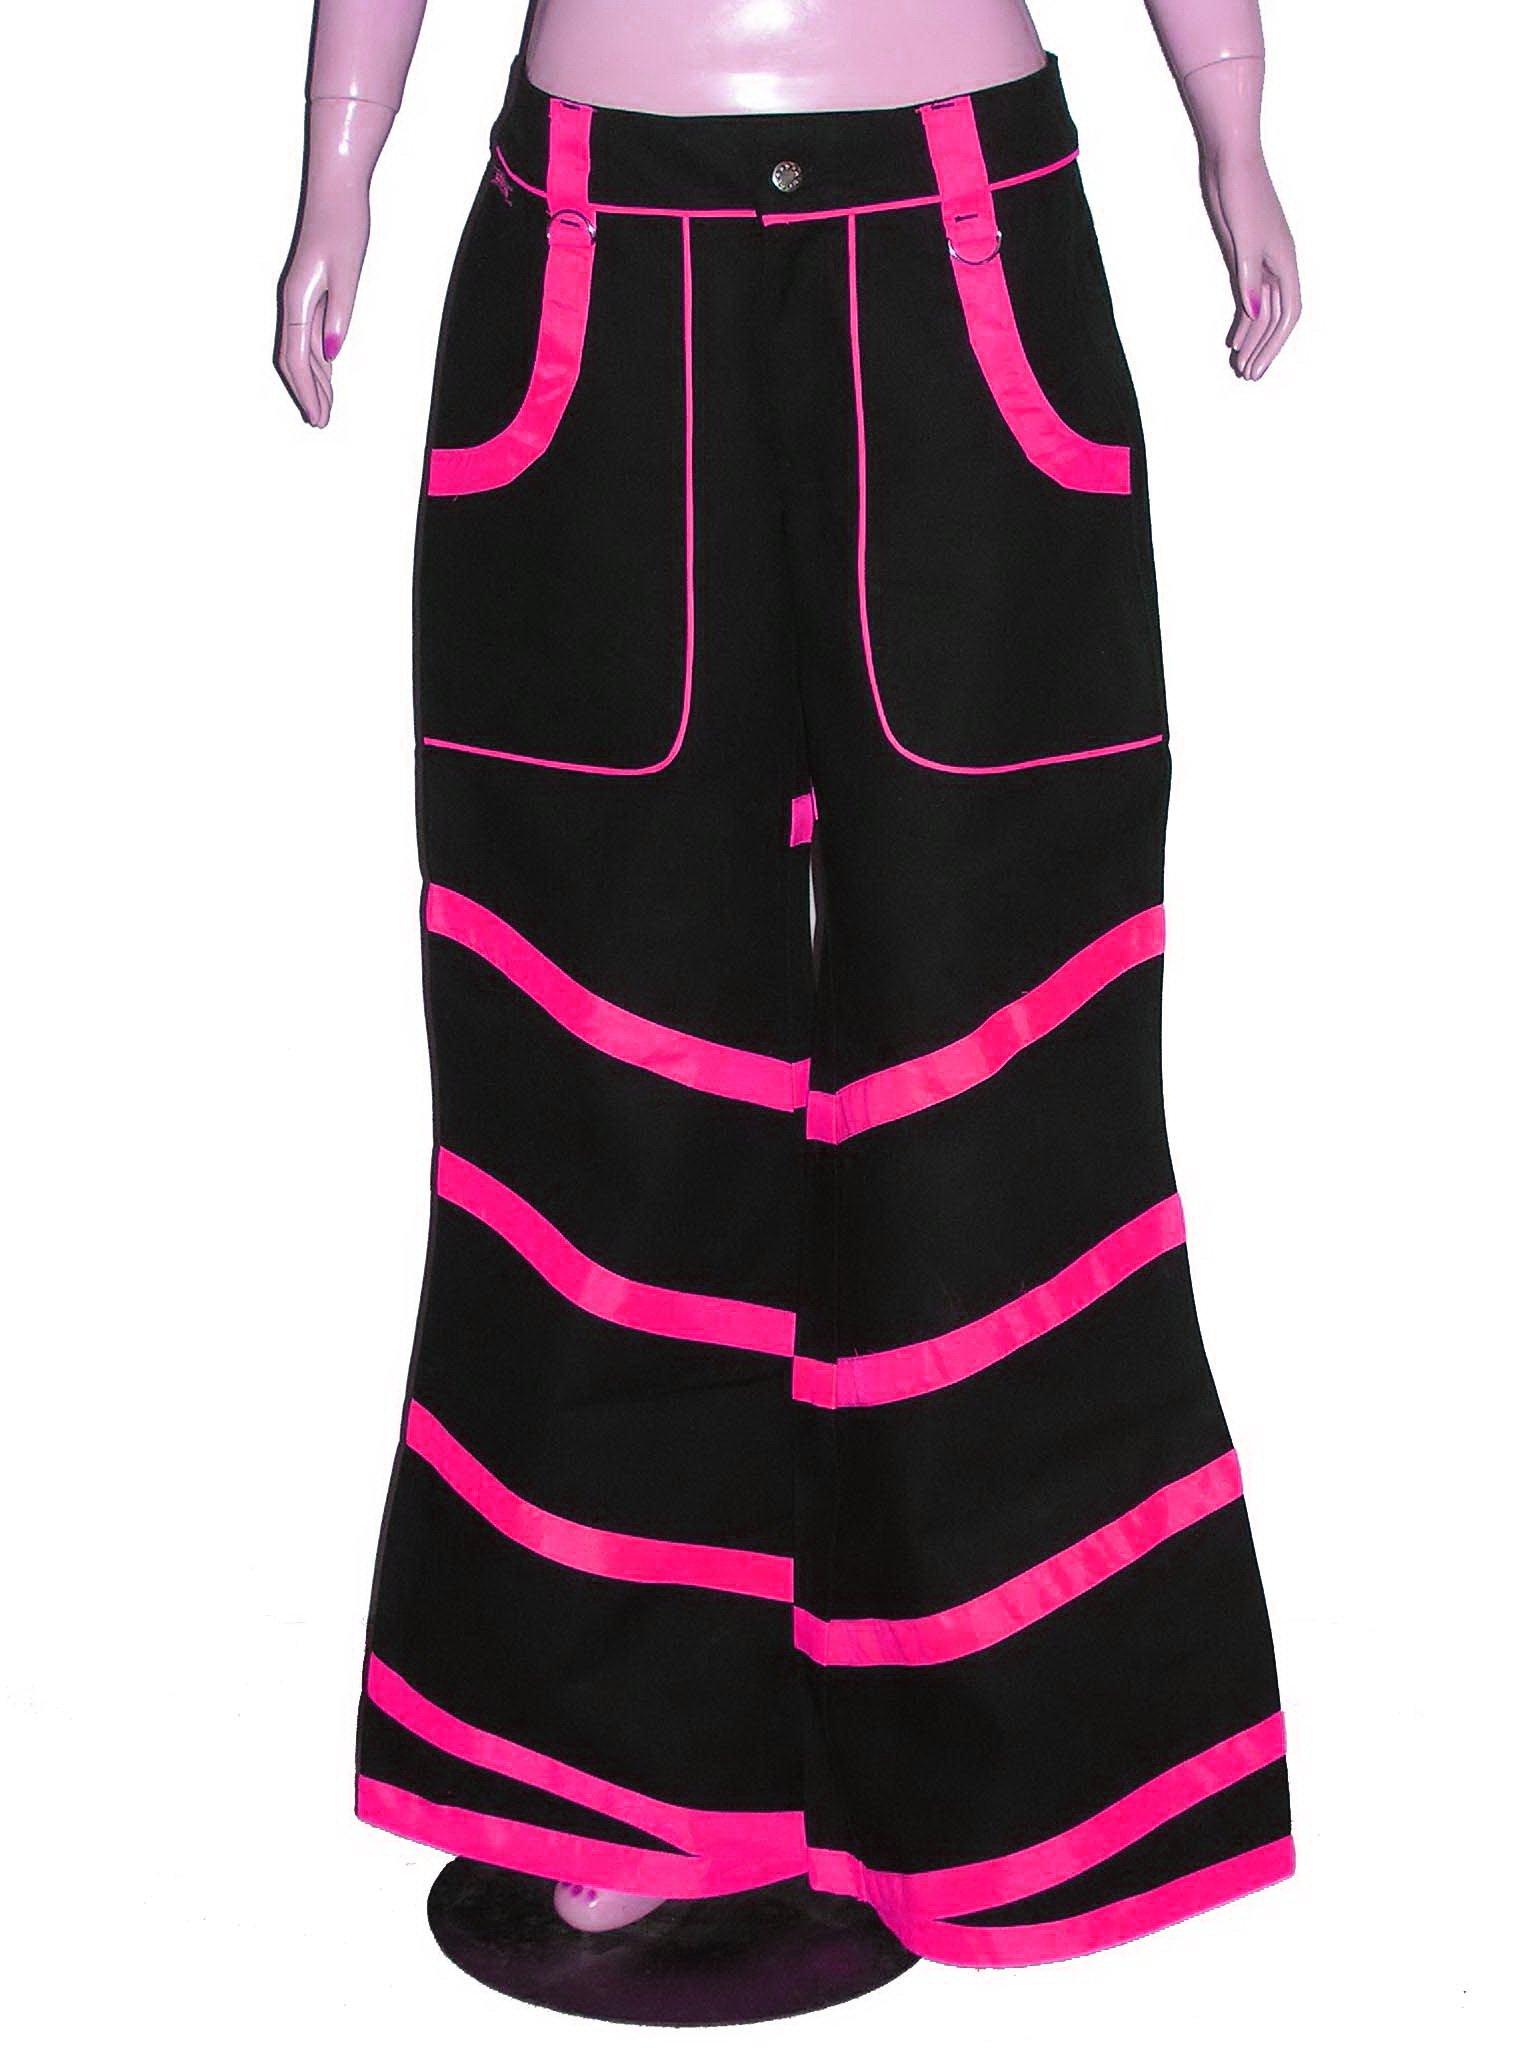 Hot Pink Neon Uv Unisex Baggy Bondage Trousers Skater Cyber Rave Gothic Punk USA by alltofashion